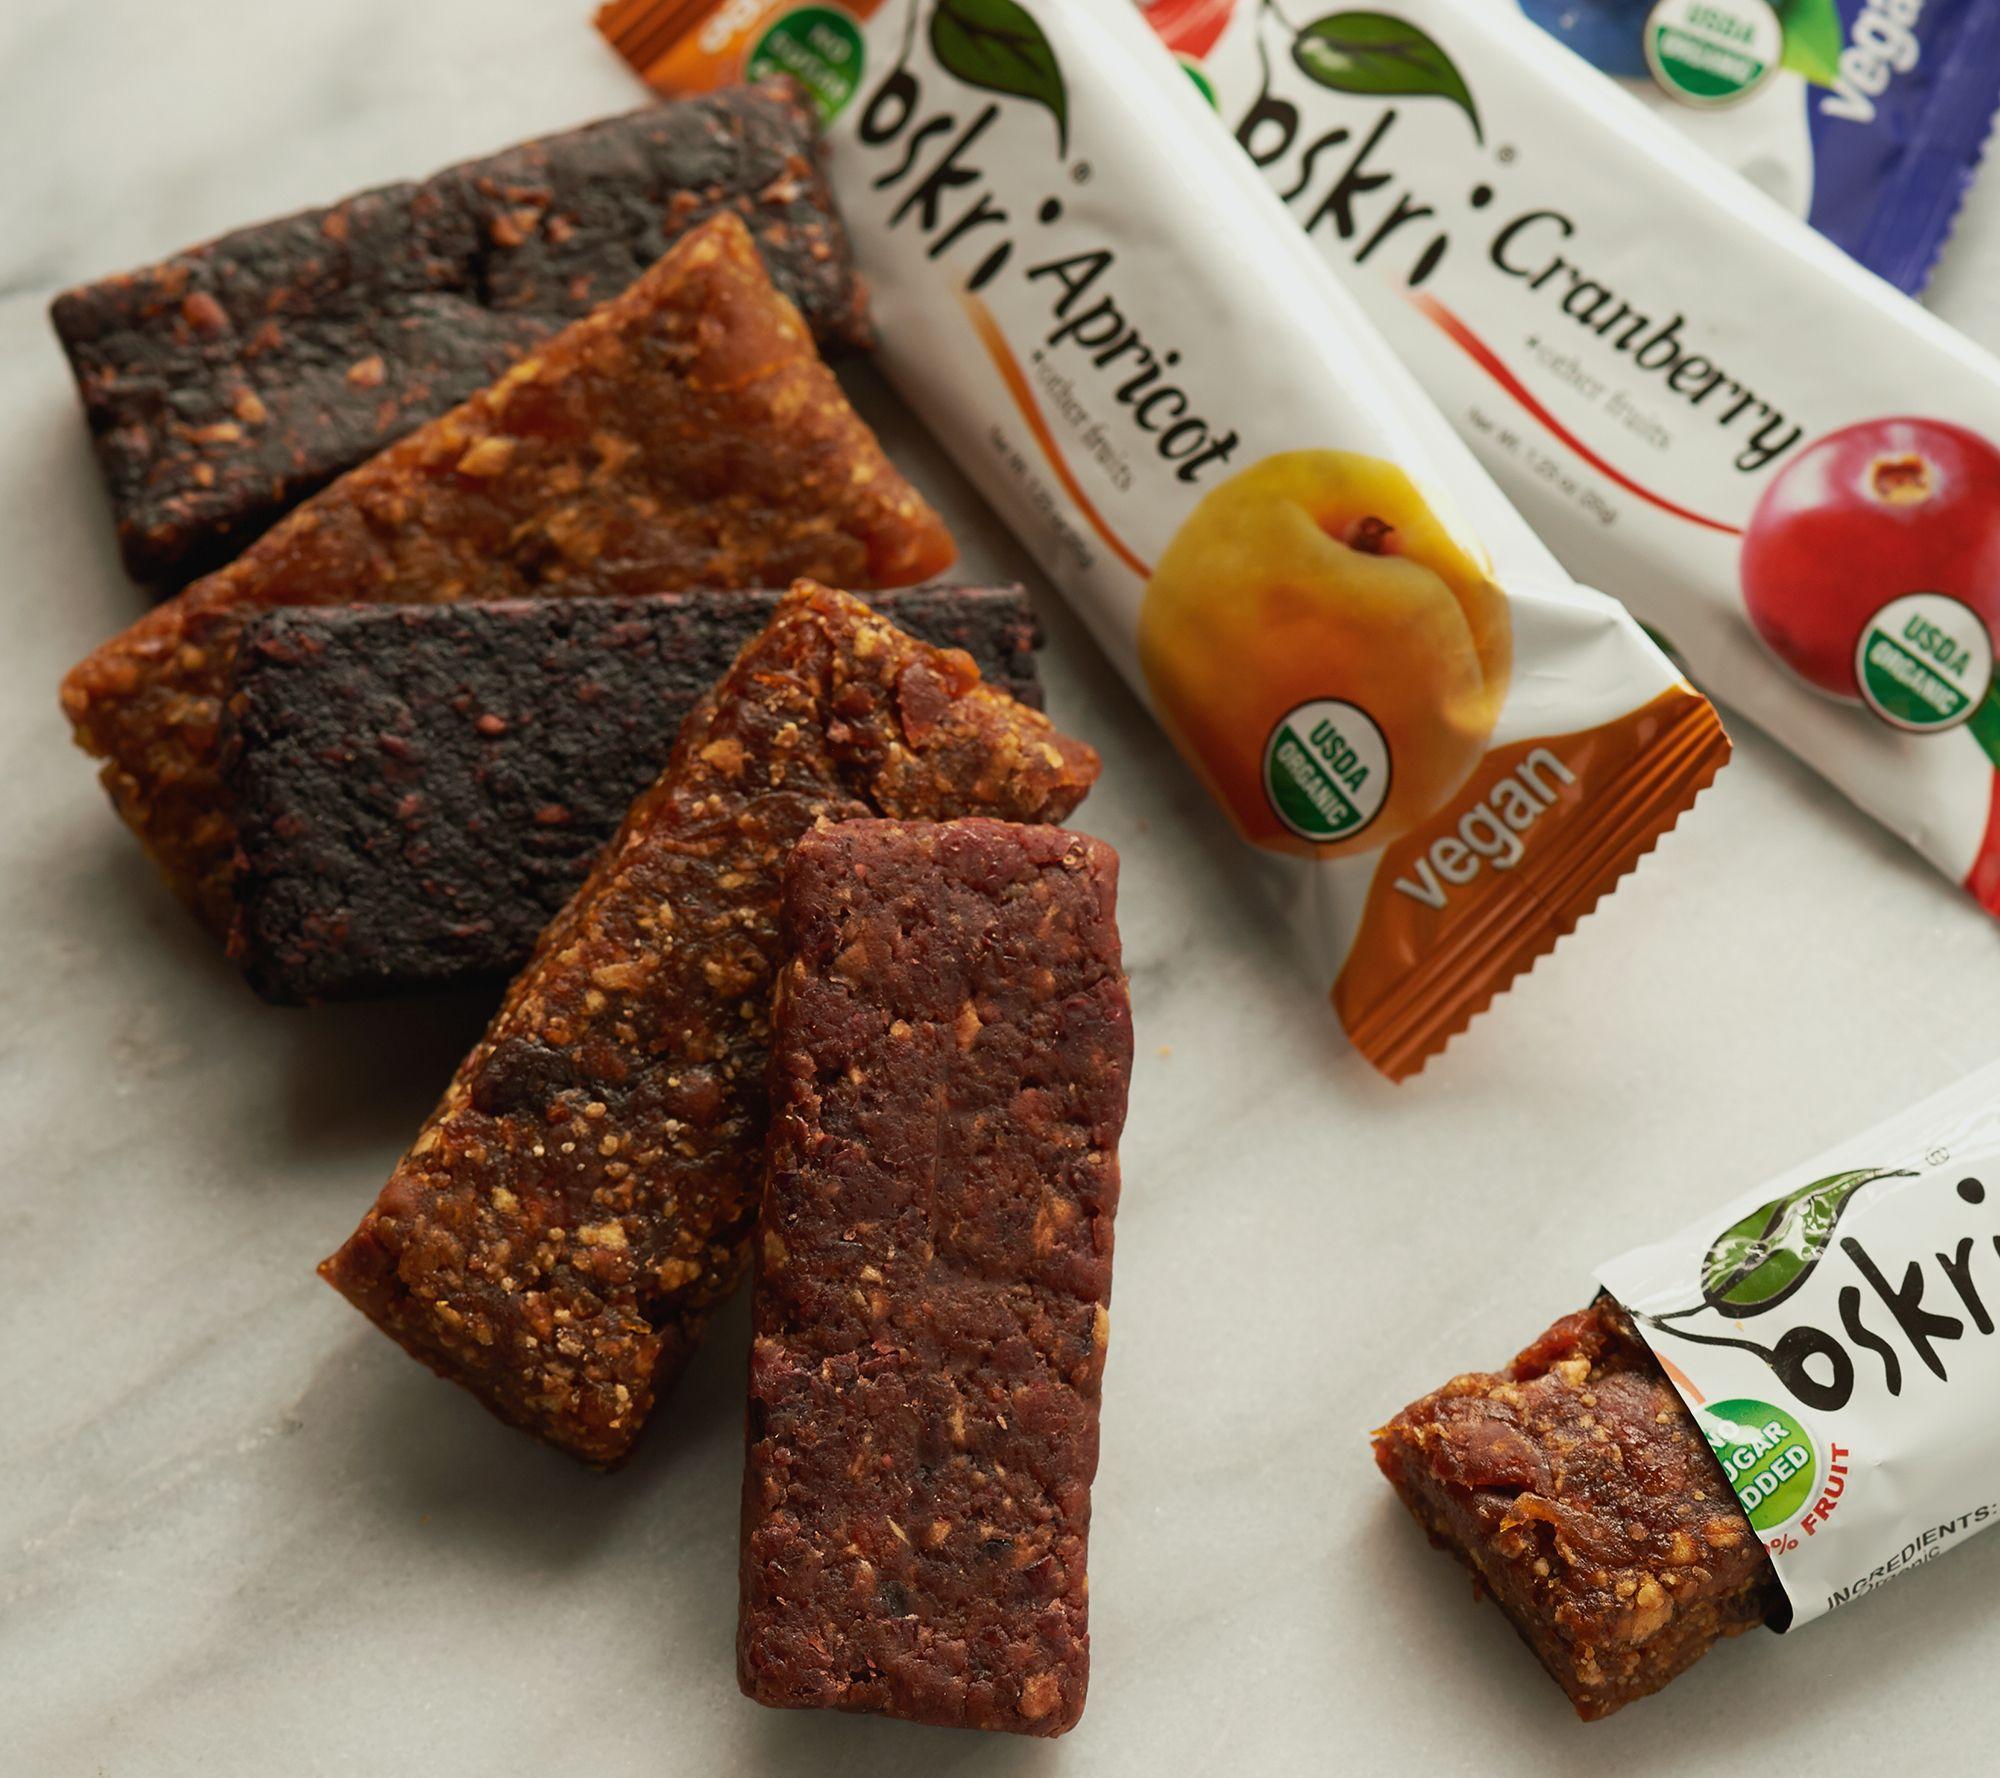 oskri 25 1 23 oz 100 fruit bar variety pack page 1 u2014 qvc com